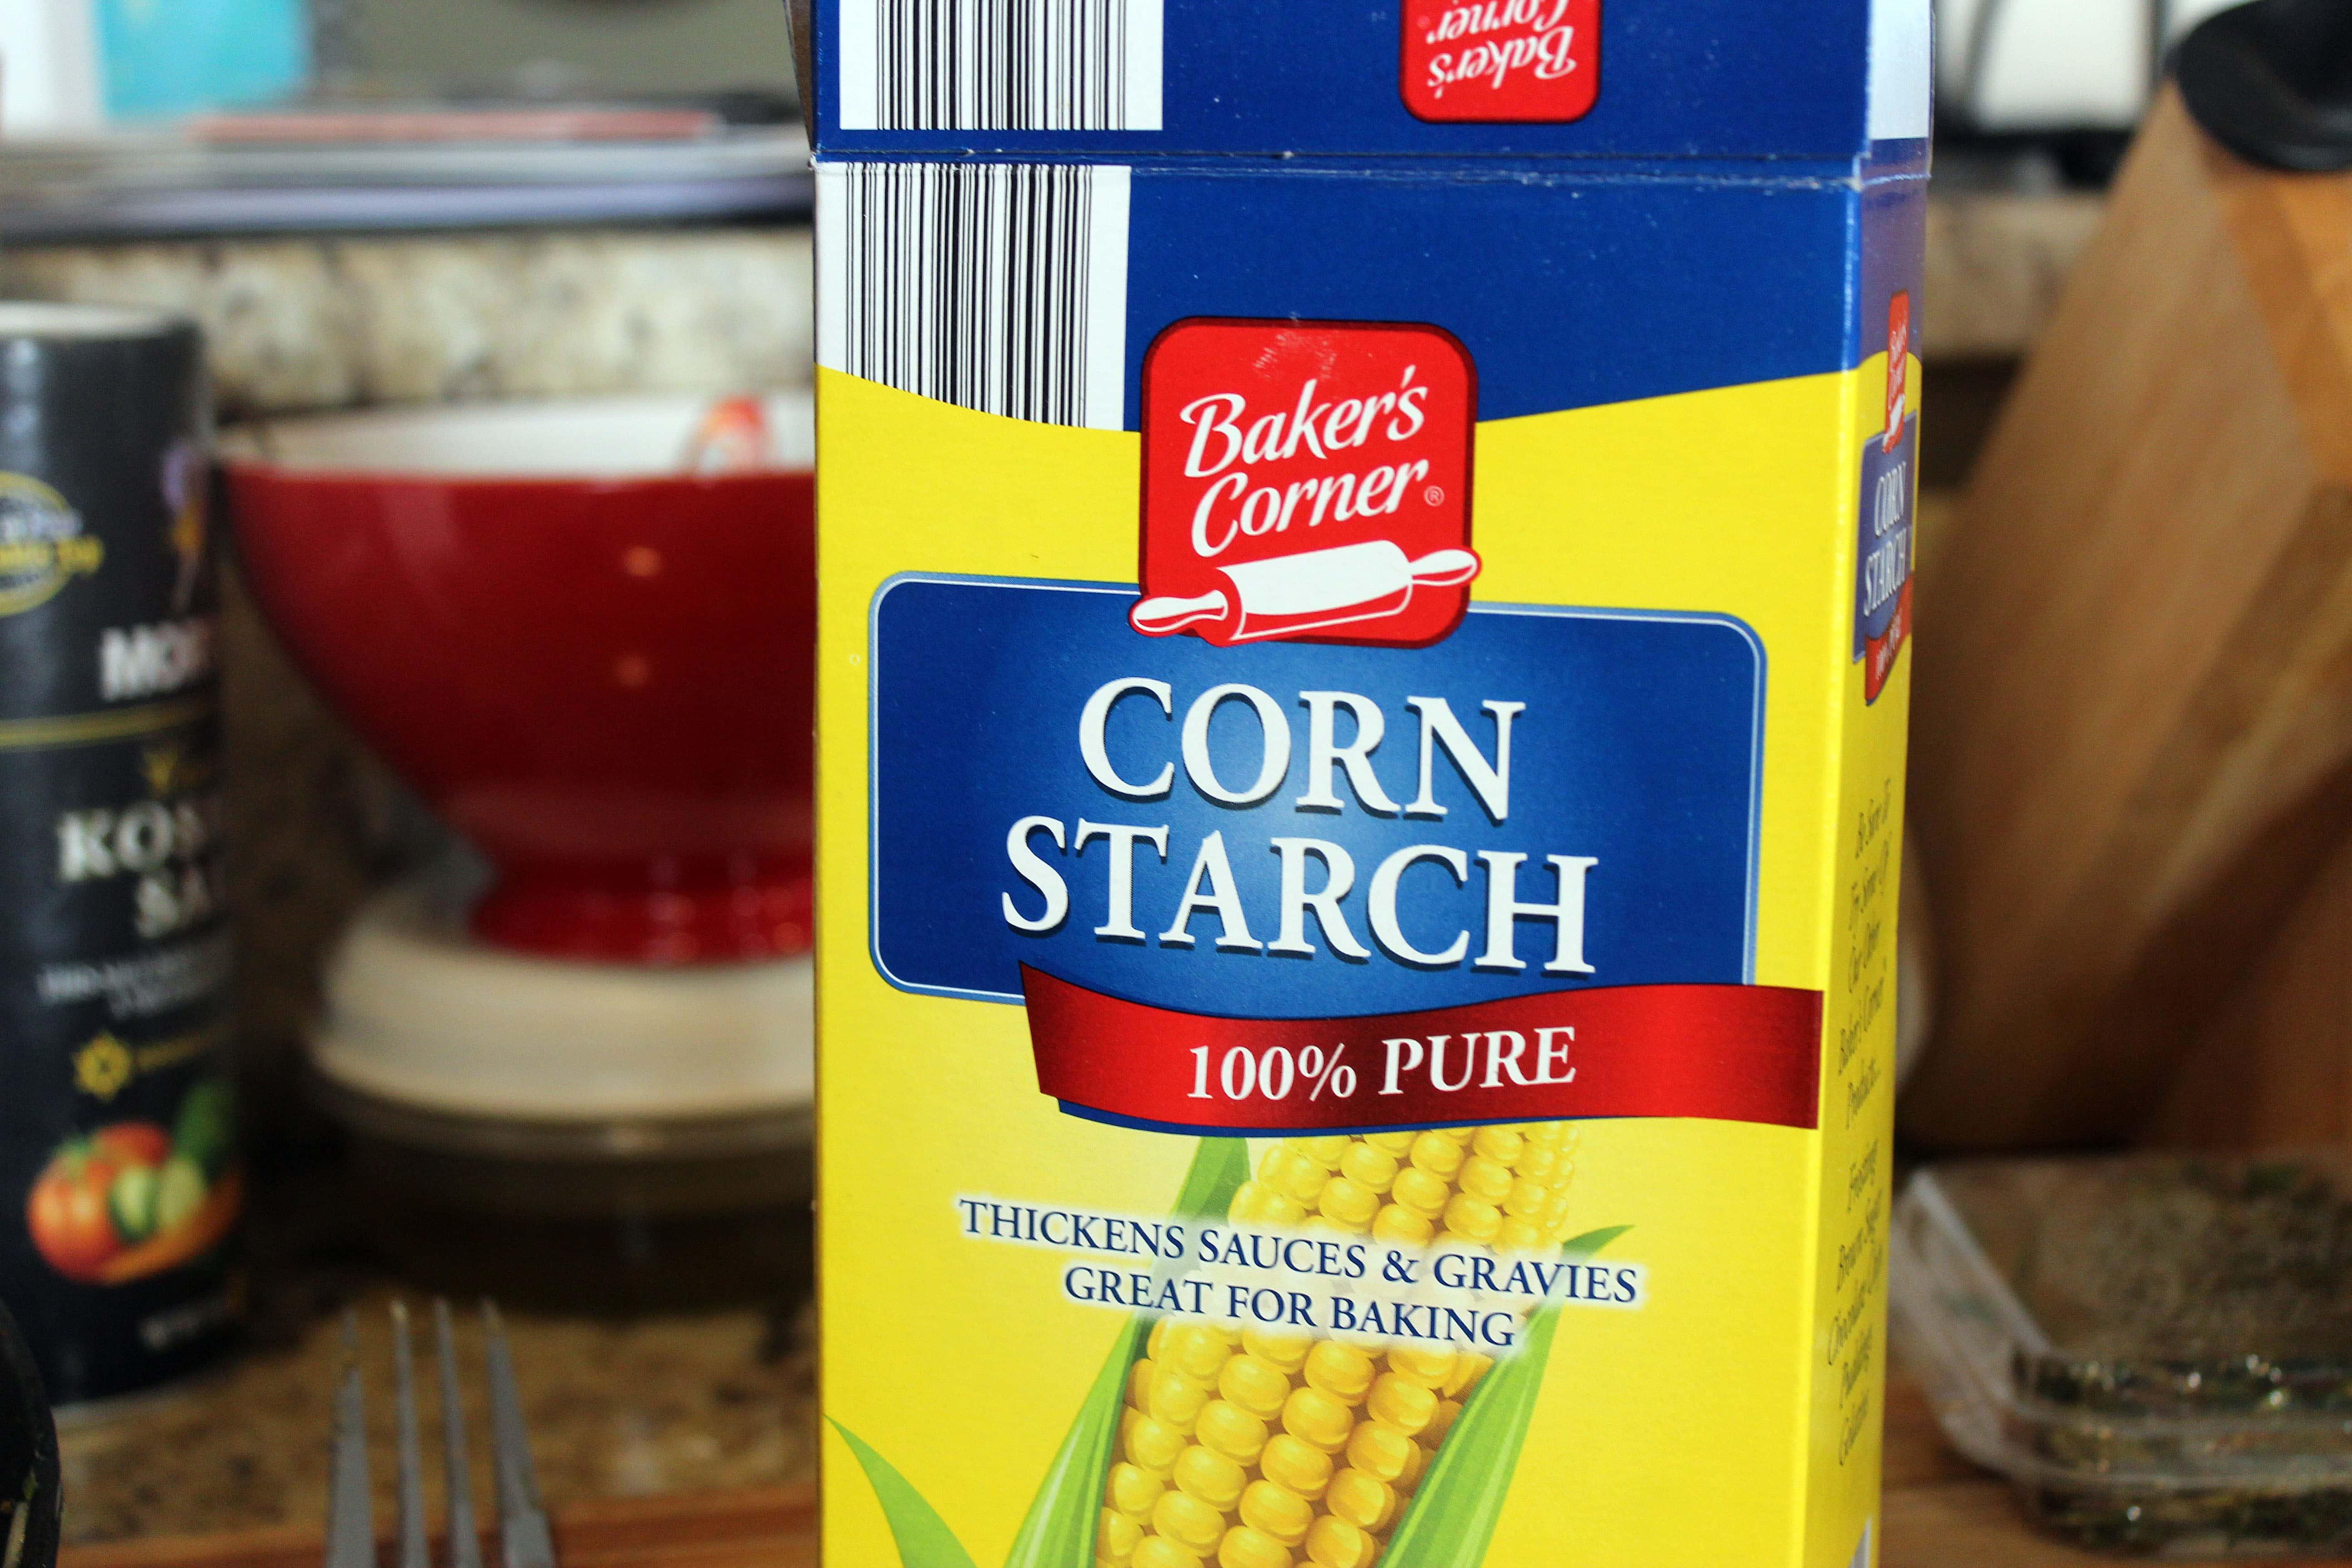 Grab cornstarch